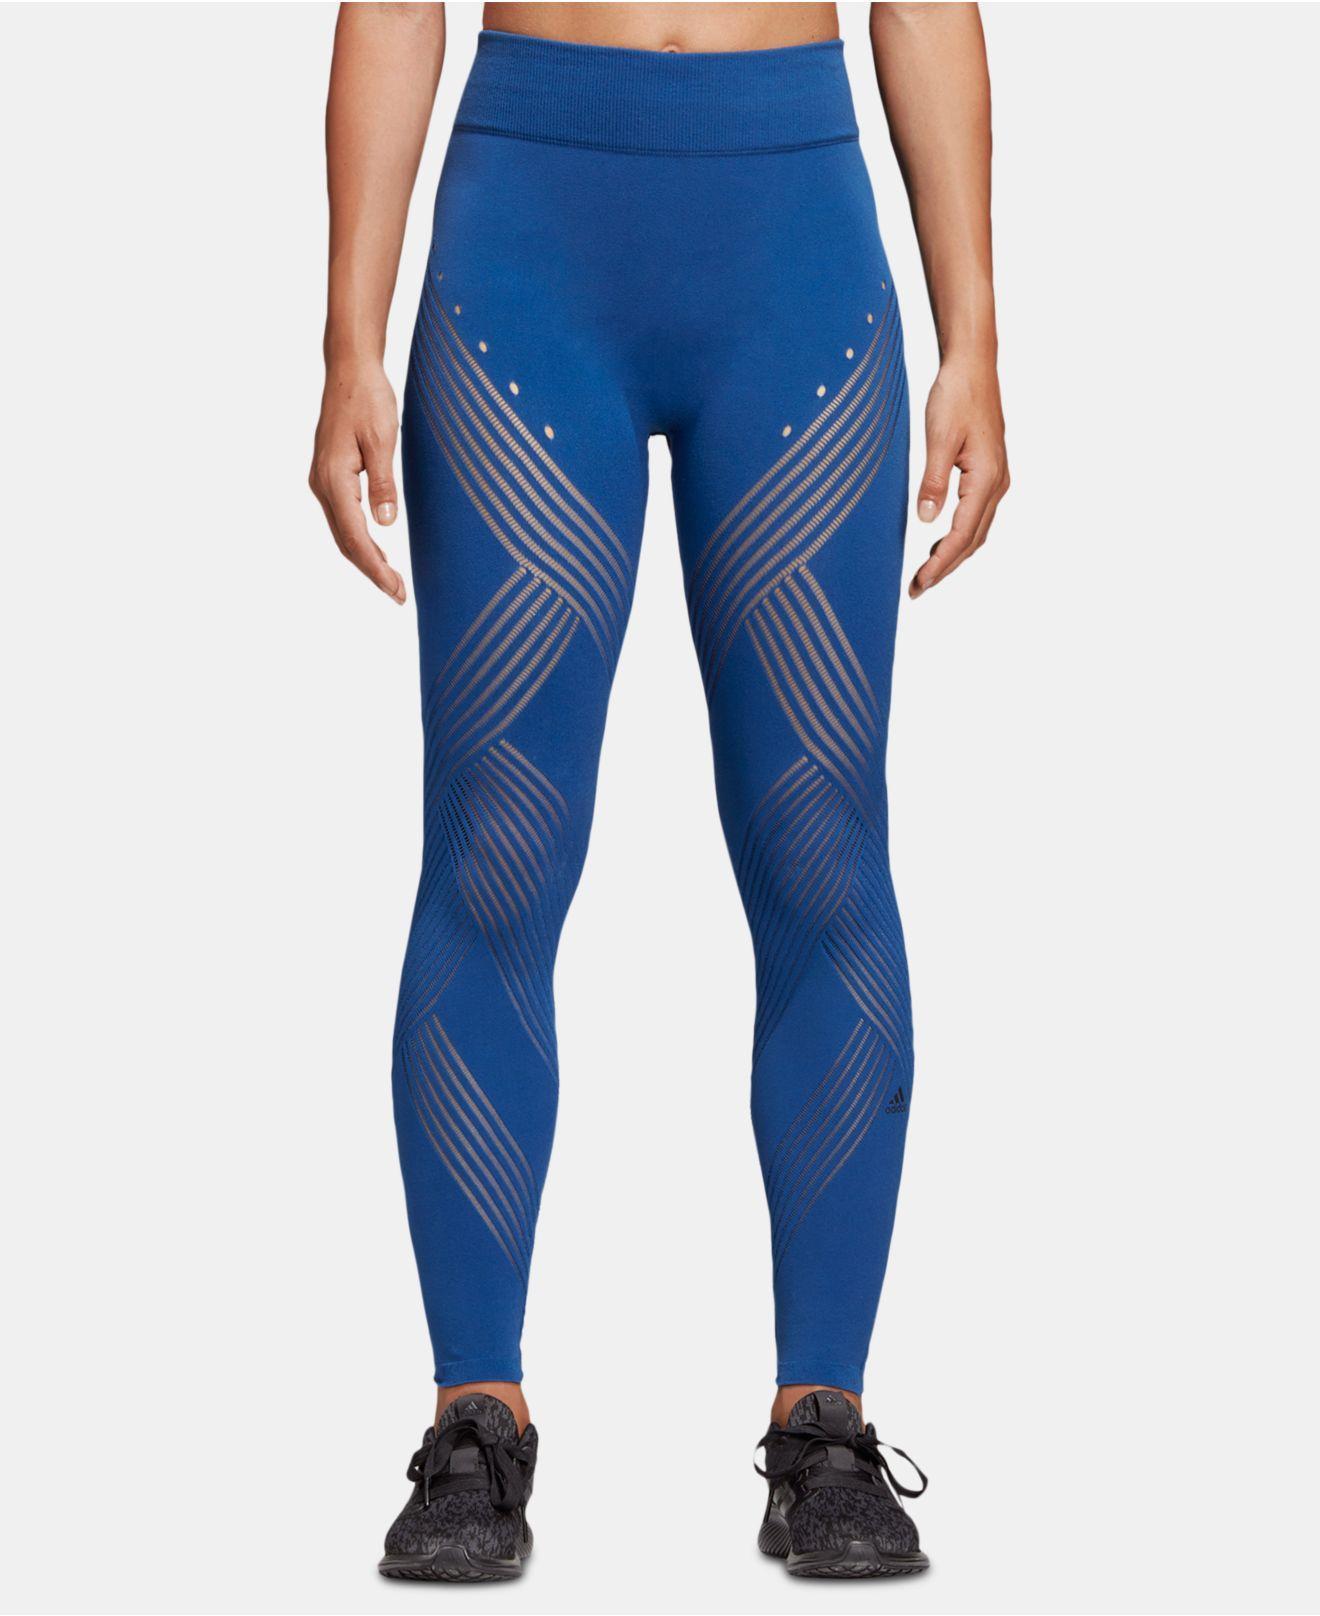 9a6abb803c6311 Lyst - adidas Warp Knit Ankle Leggings in Blue